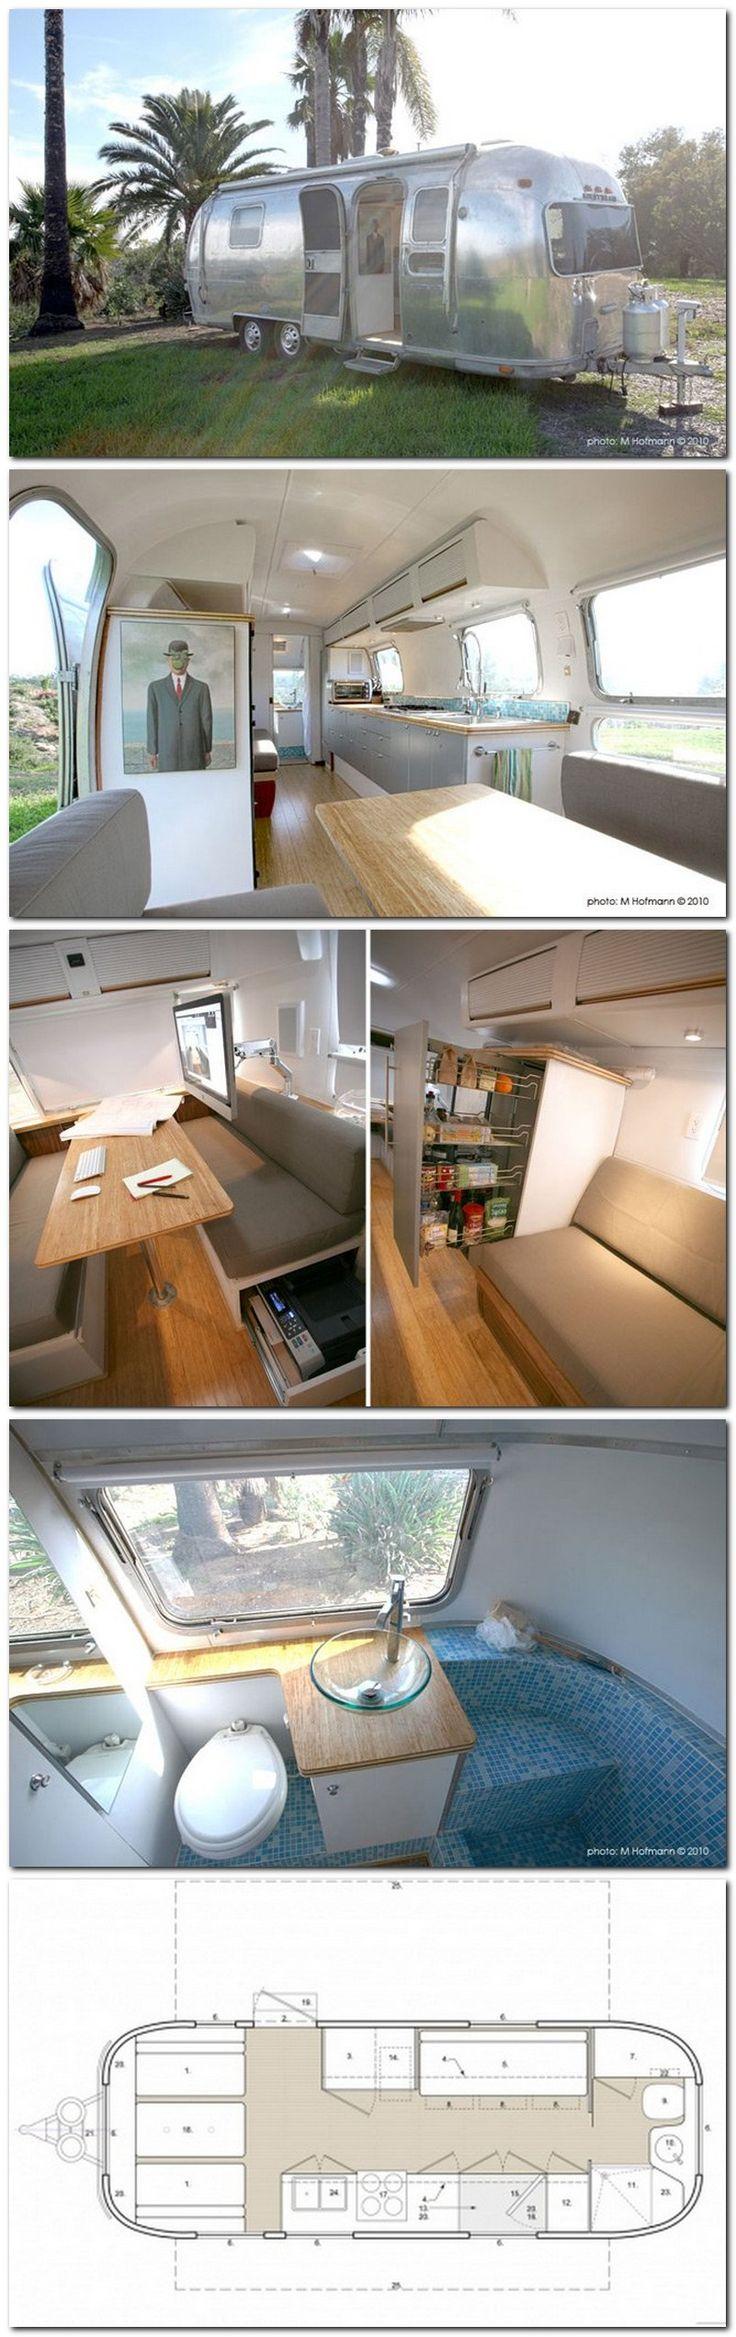 #Caravanas by Hoffman Architecture #interiordesing